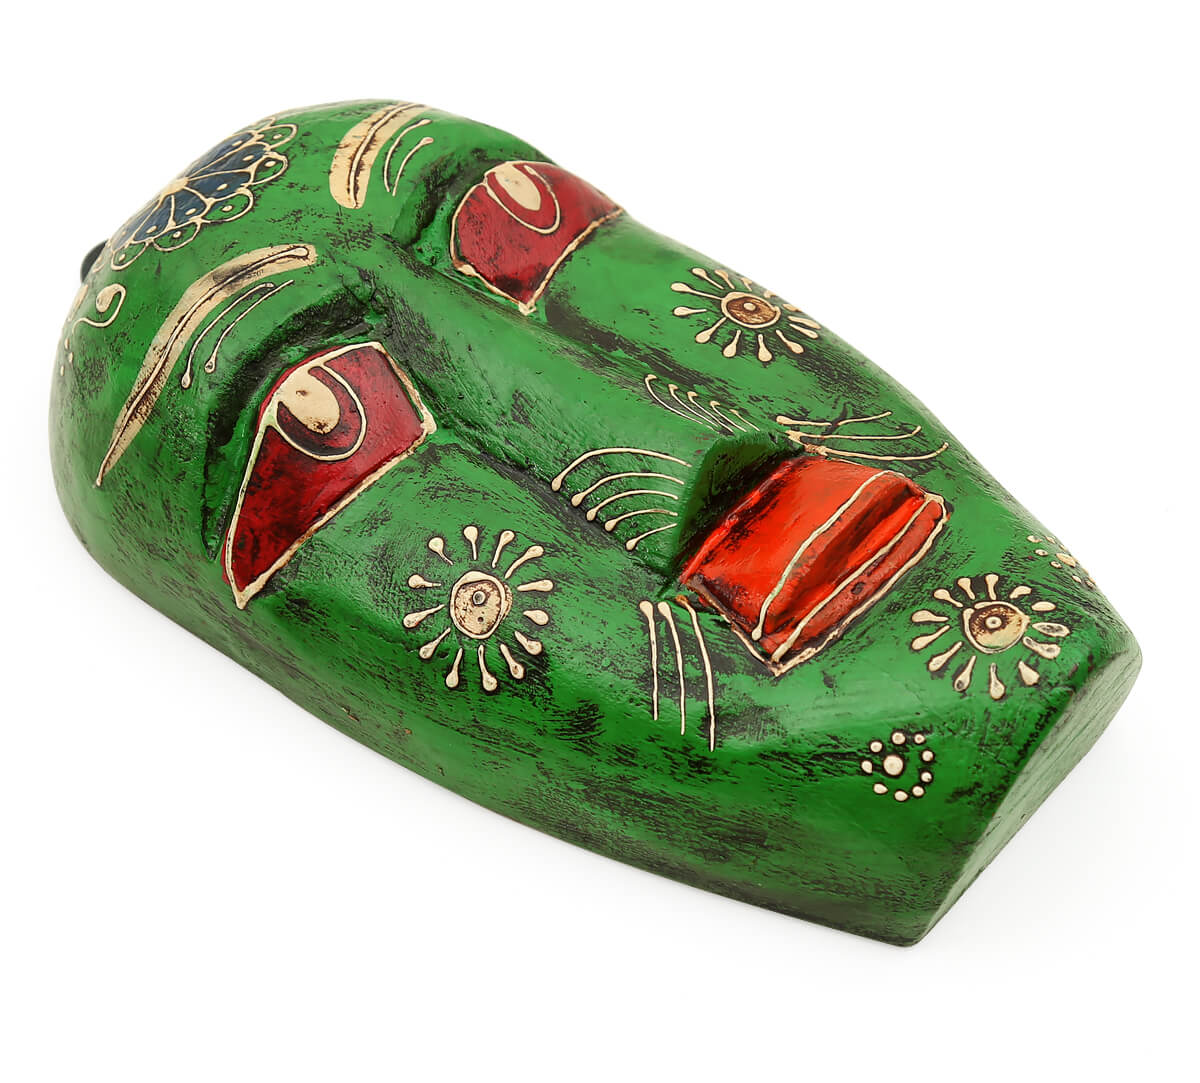 Olive Hobgoblin Decorative Wooden Mask